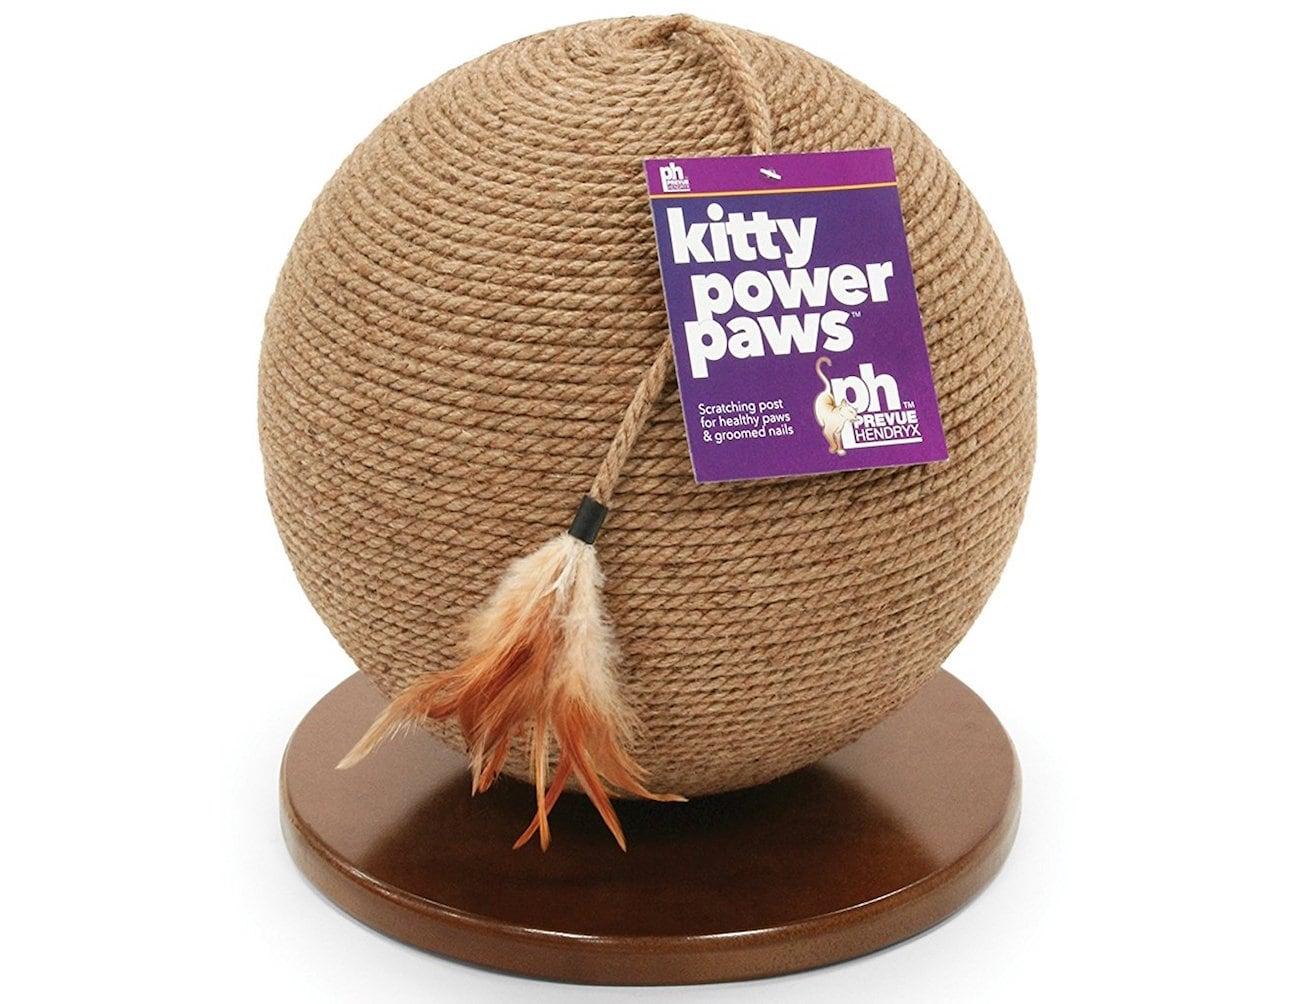 Kitty Power Paws Jute Cat Sphere